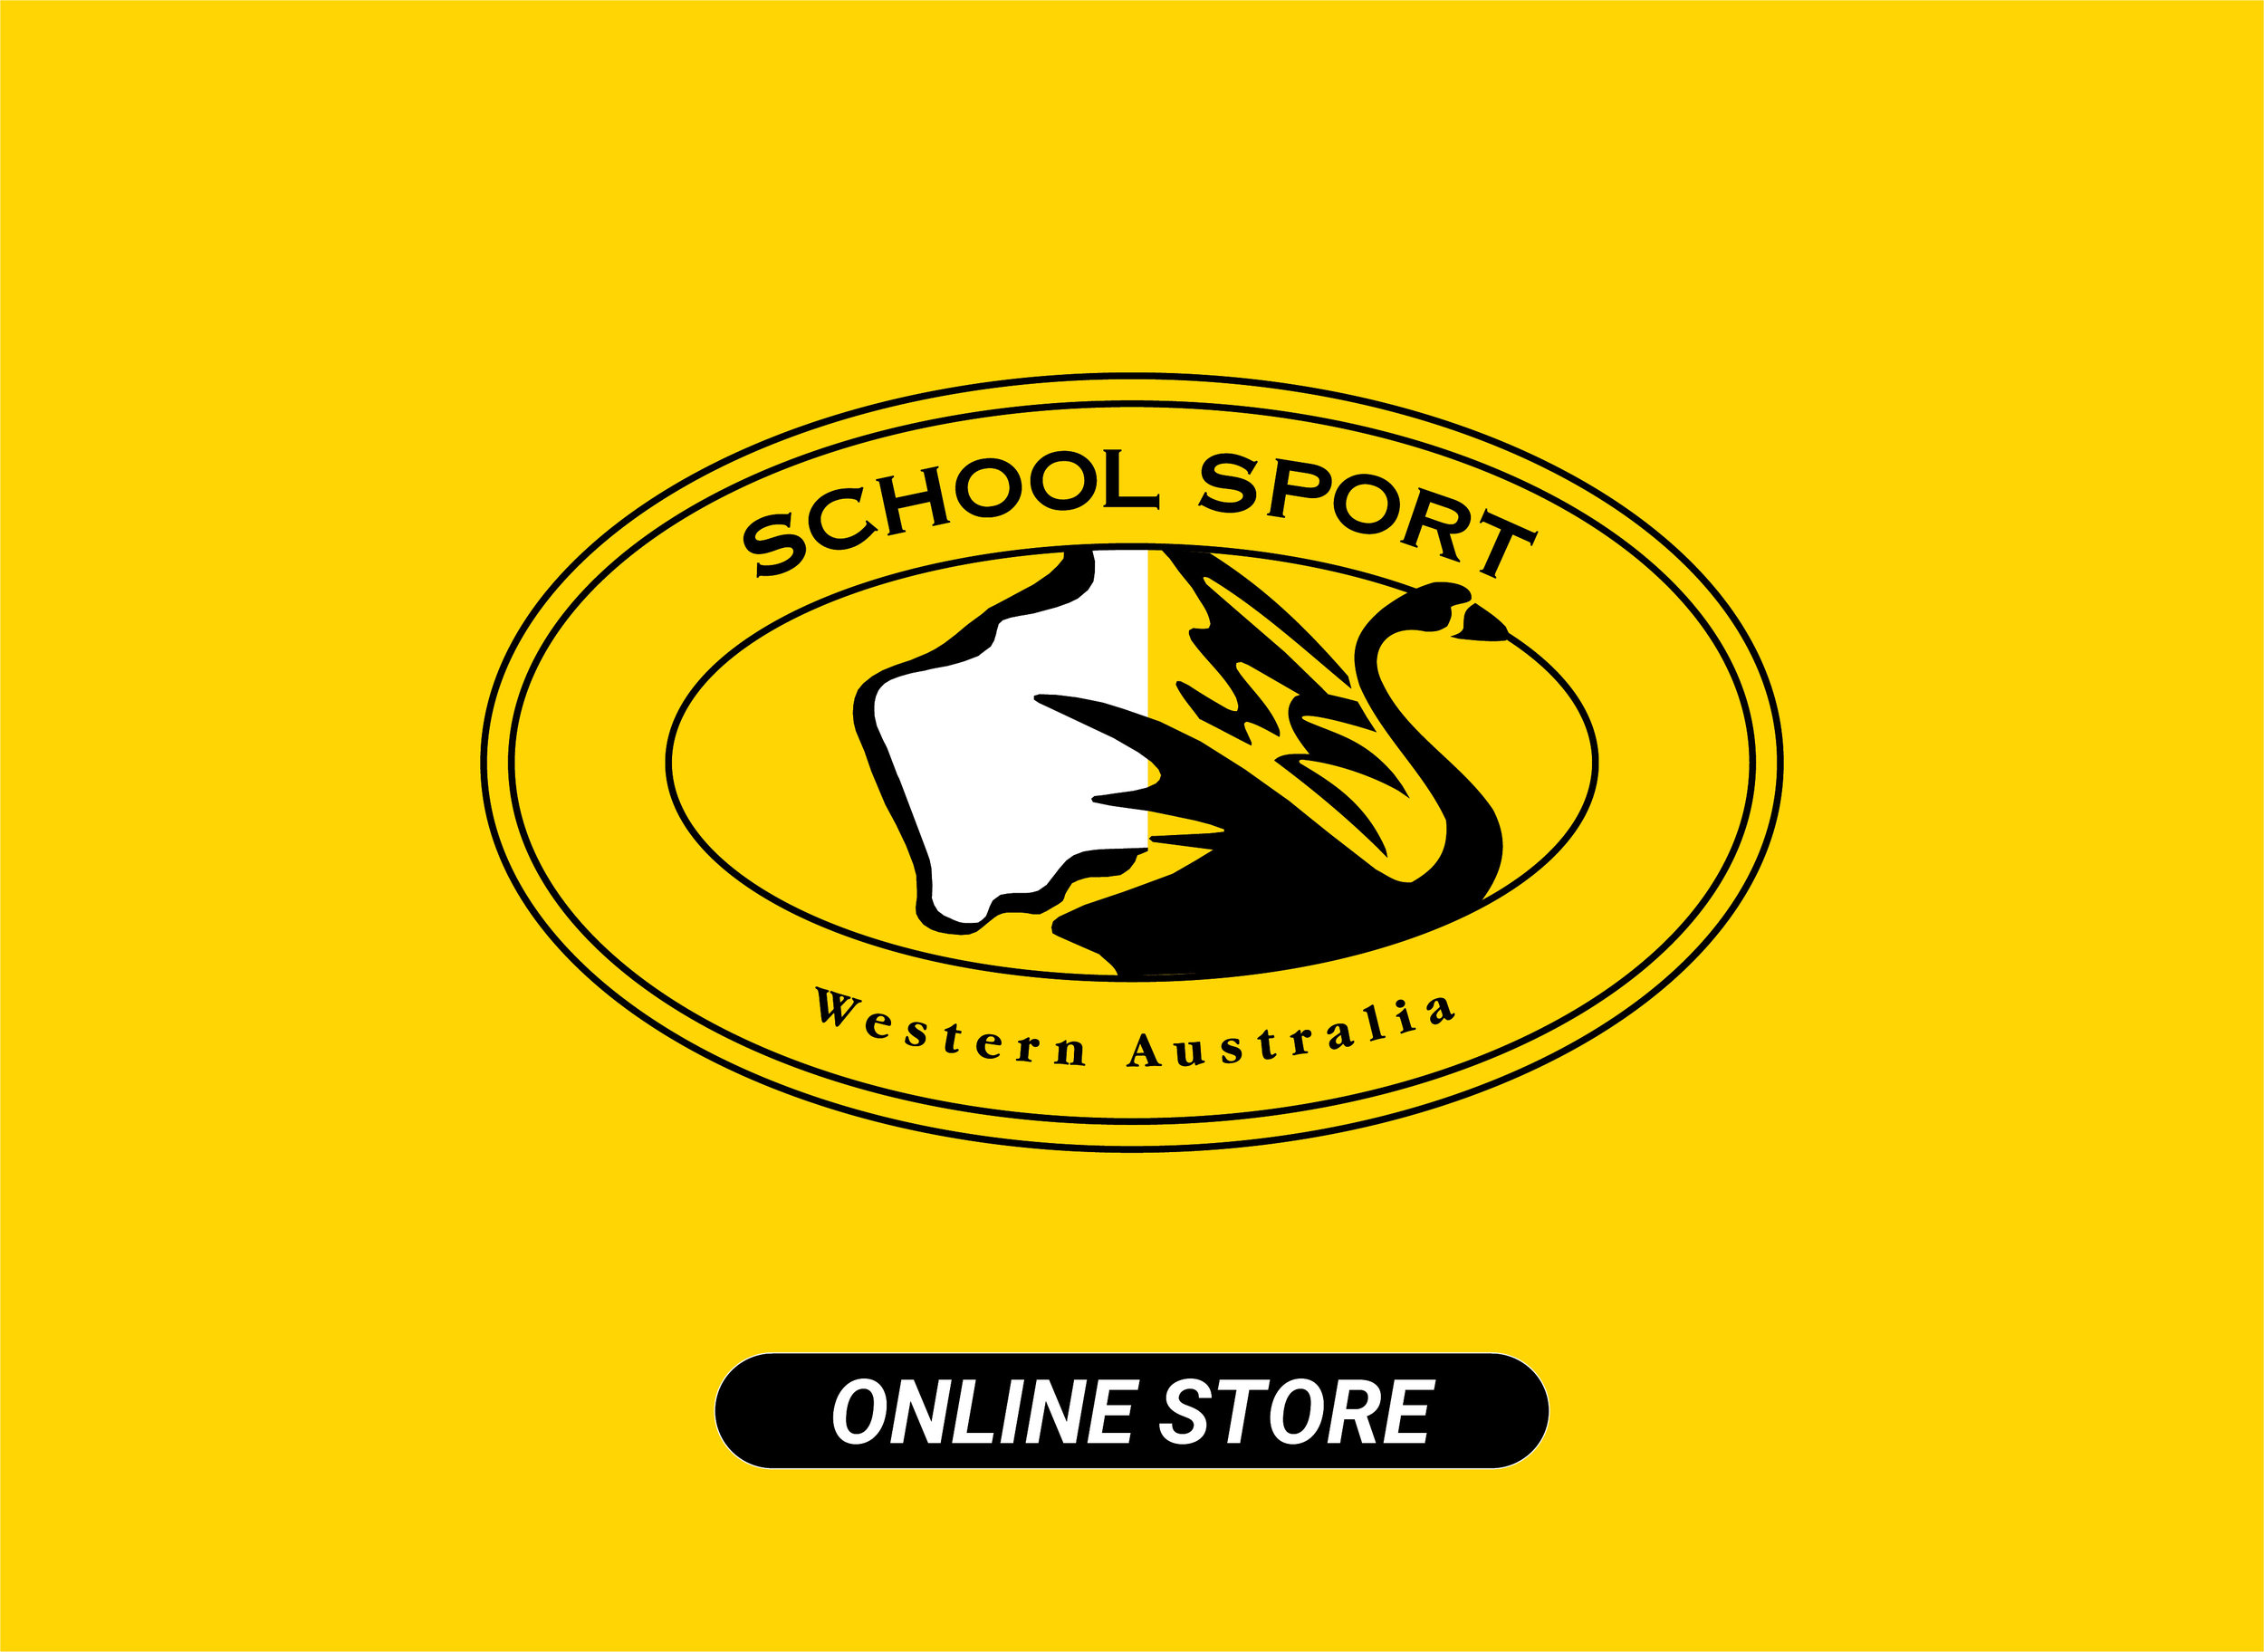 https://schoolsportwa.Ontracksportswear.com.au